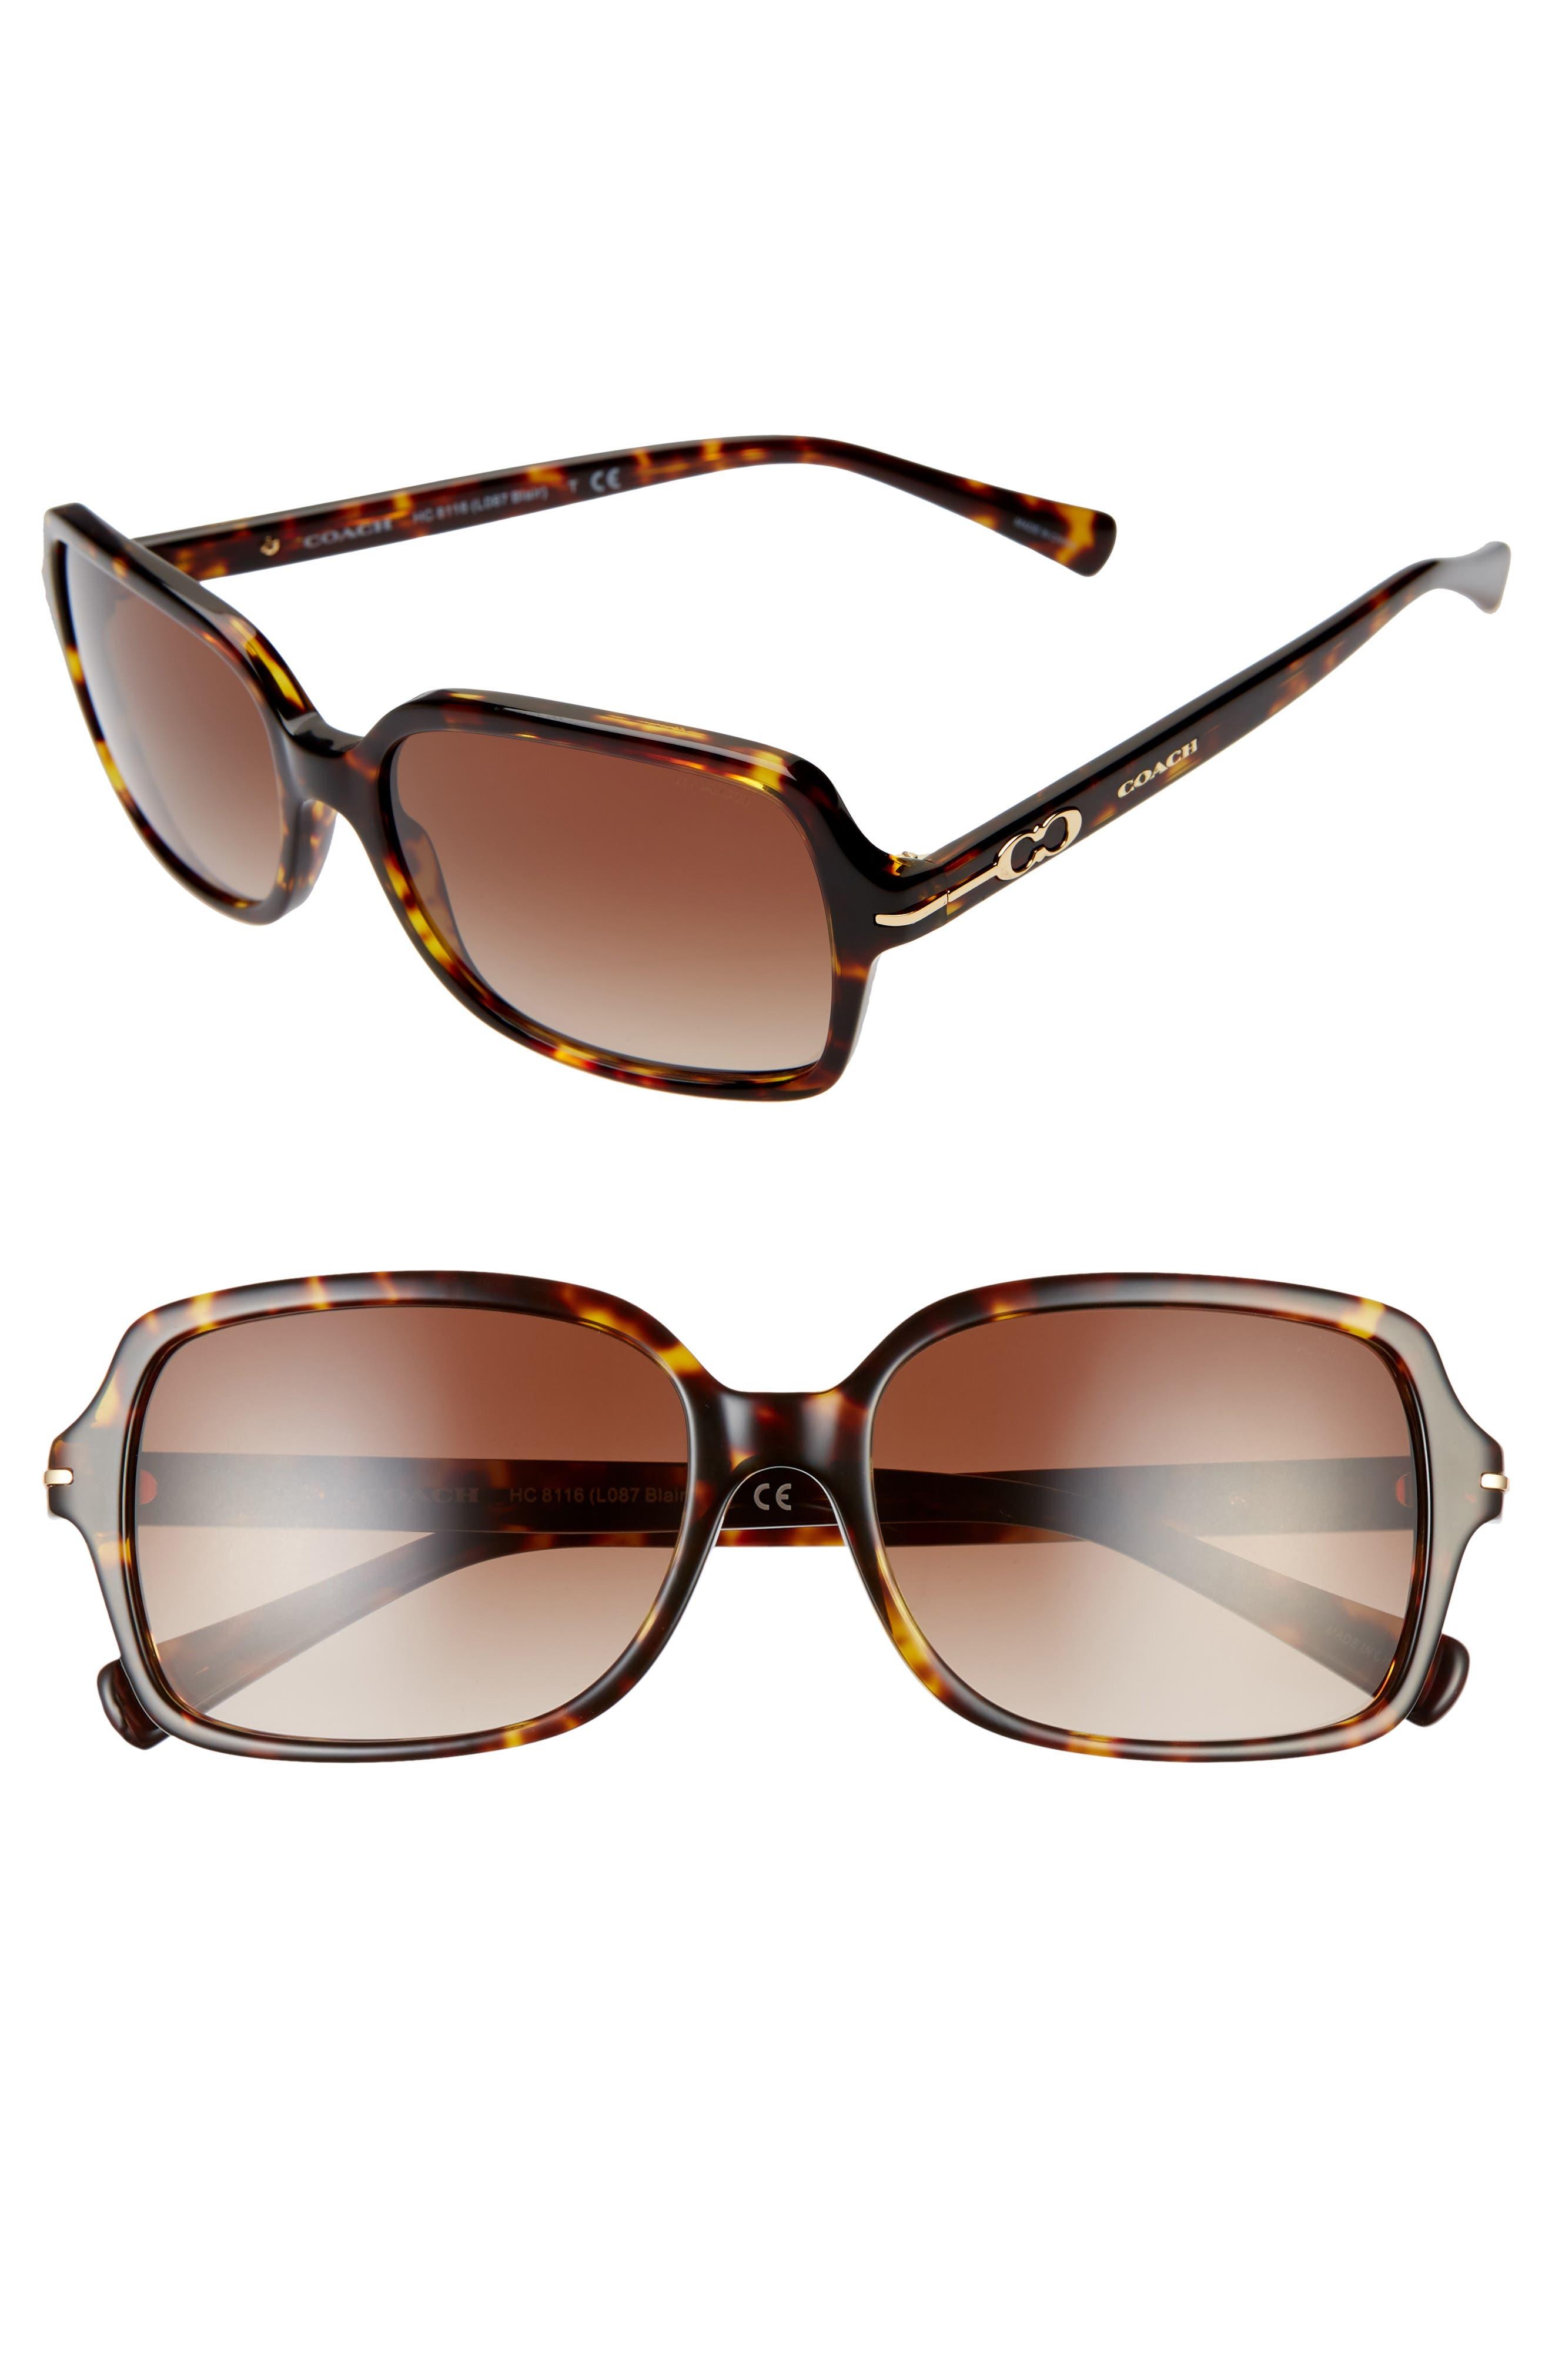 3b1fb0d1efc6 Women's Coach 56Mm Rectangular Sunglasses - Havana/ Brown Gradient